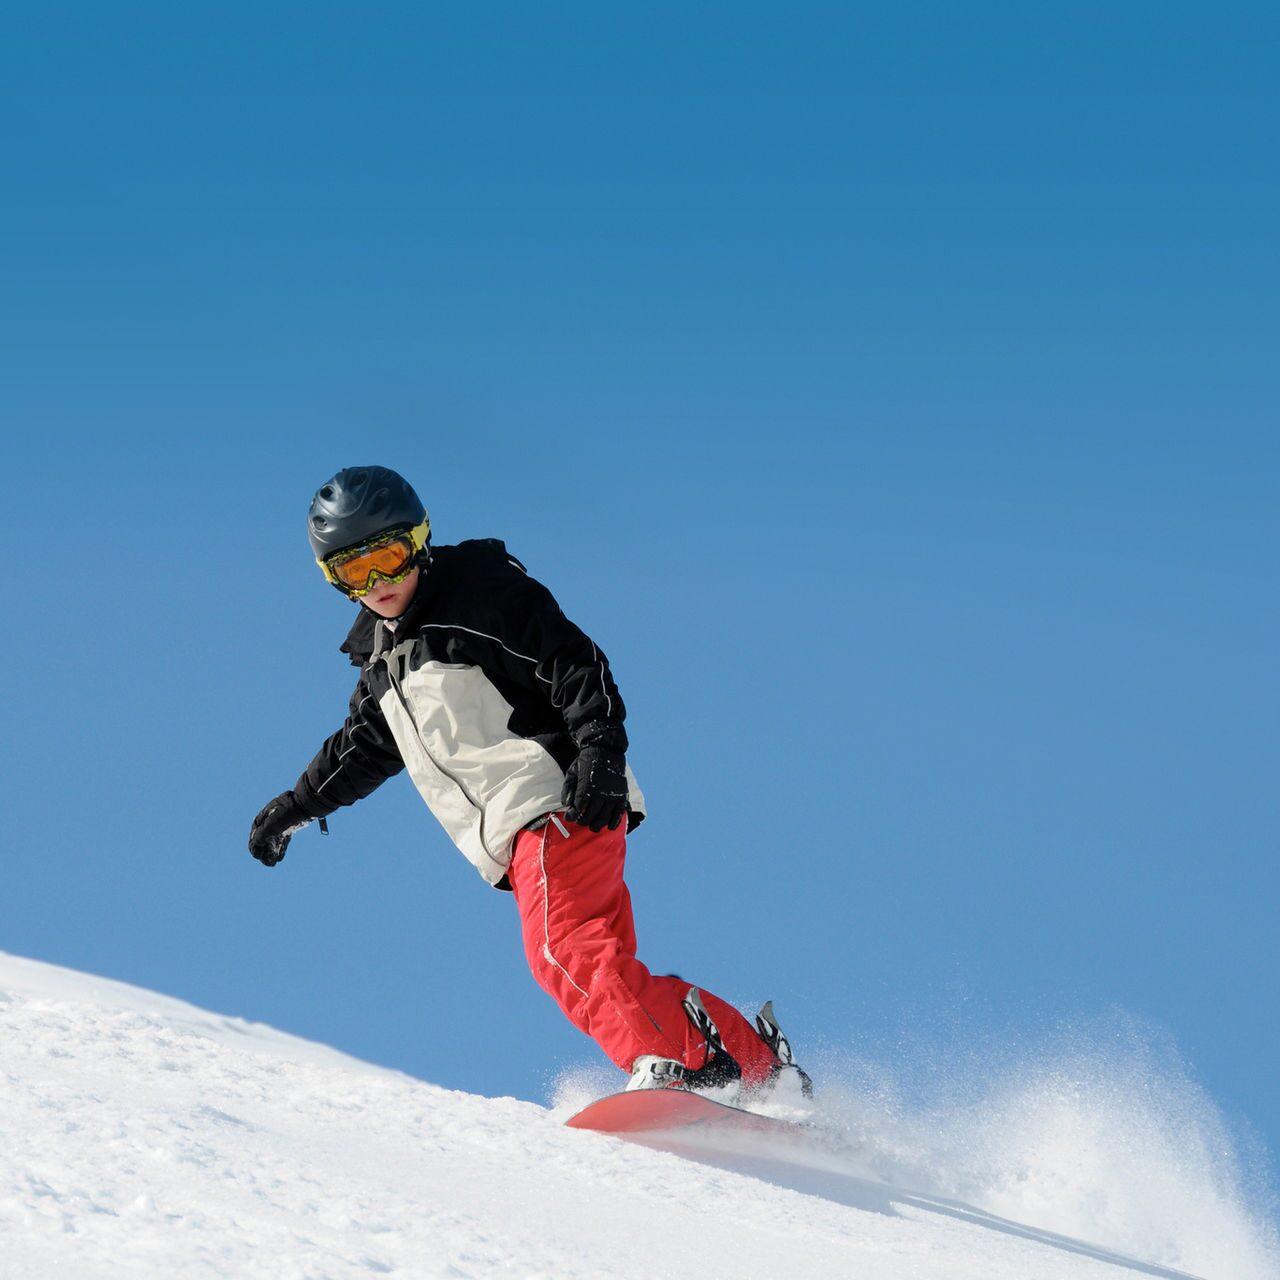 6b2e4493a5a0 Горные лыжи сноуборд бу, прокат горных лыж сноубордов Москва ...